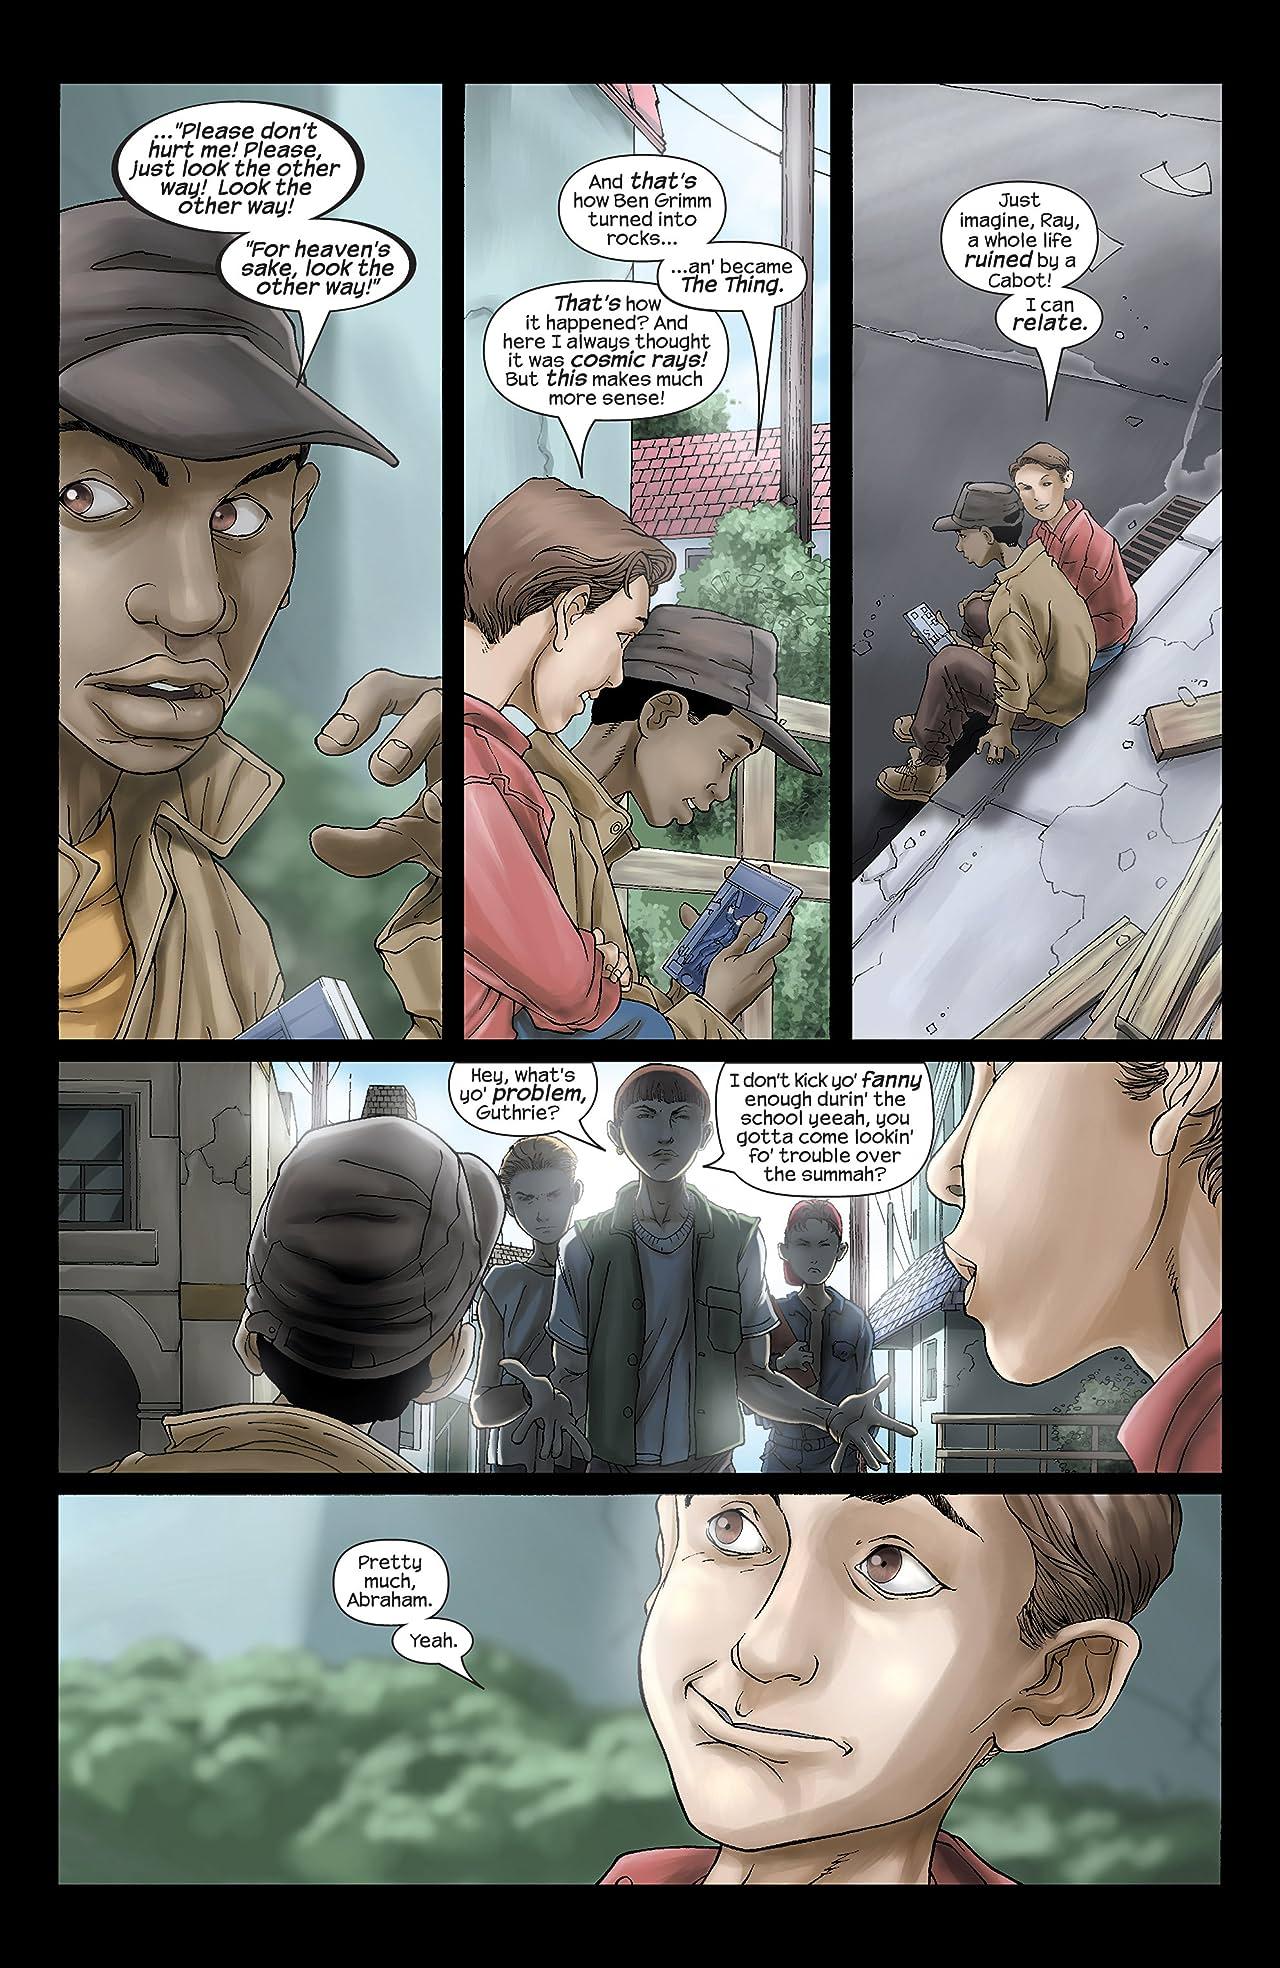 Uncanny X-Men Vol. 5: She Lies With Angels